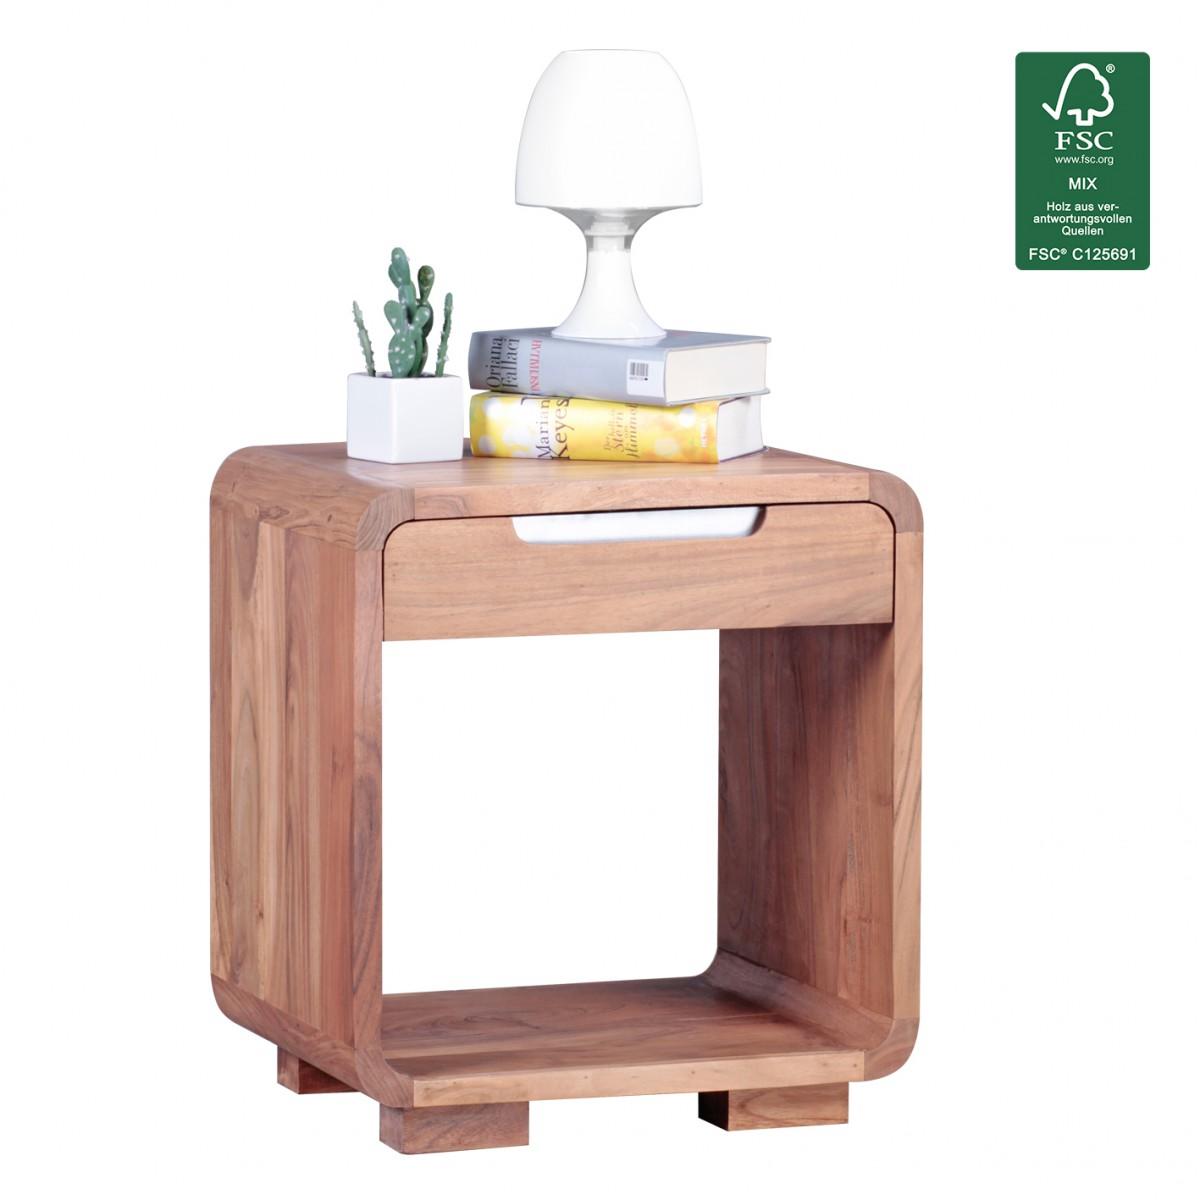 boxspringbett holz mit schubladen. Black Bedroom Furniture Sets. Home Design Ideas